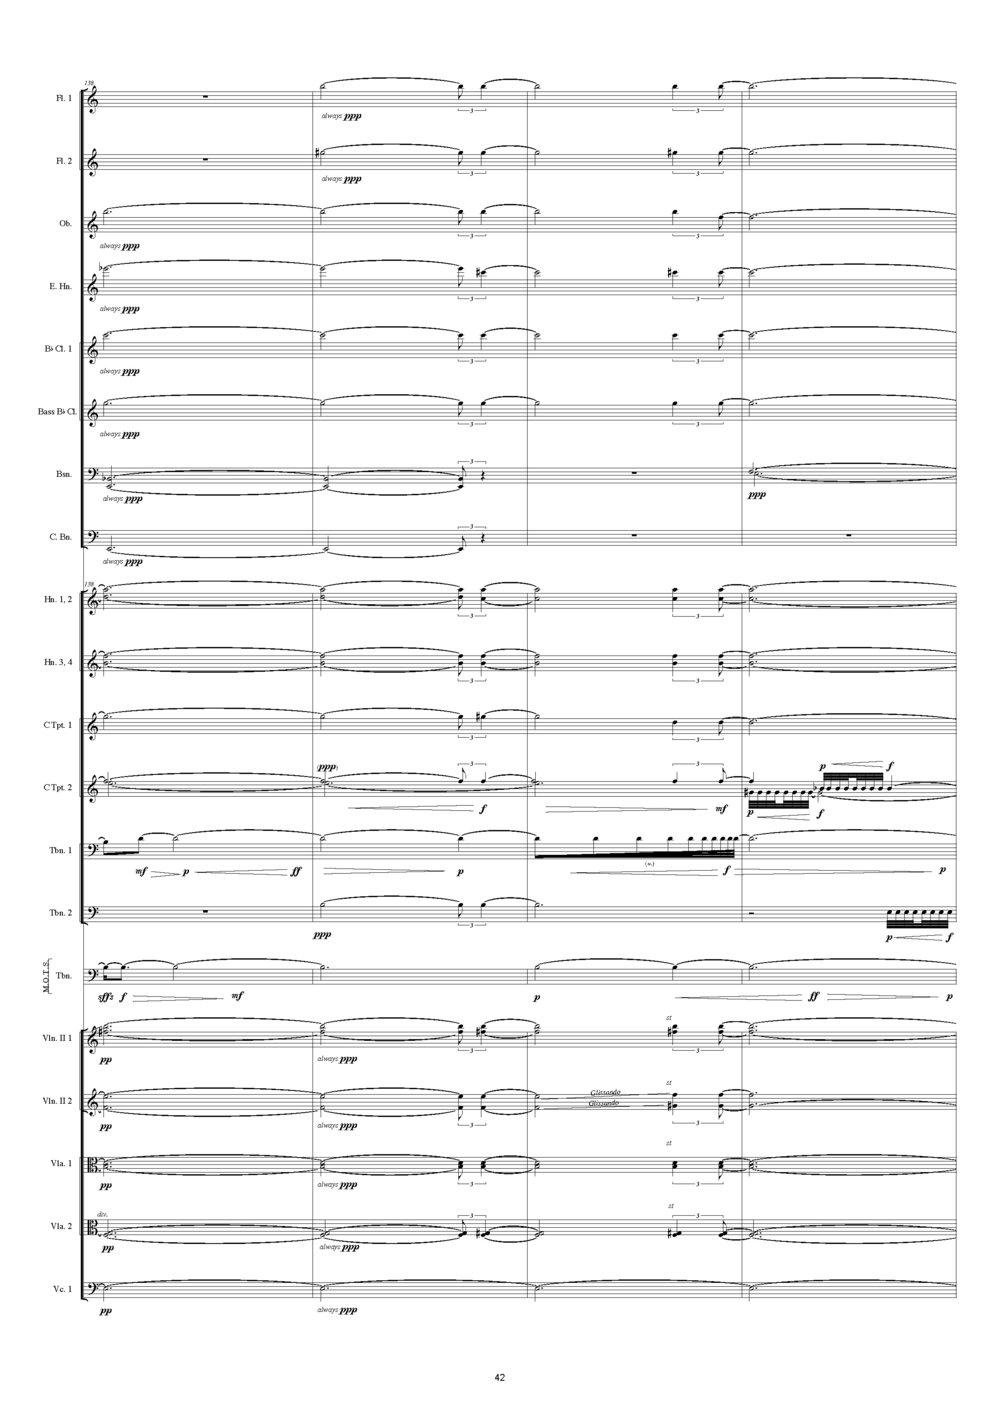 METANOIA_2009-RAPPOPORT_Seite_42.jpg